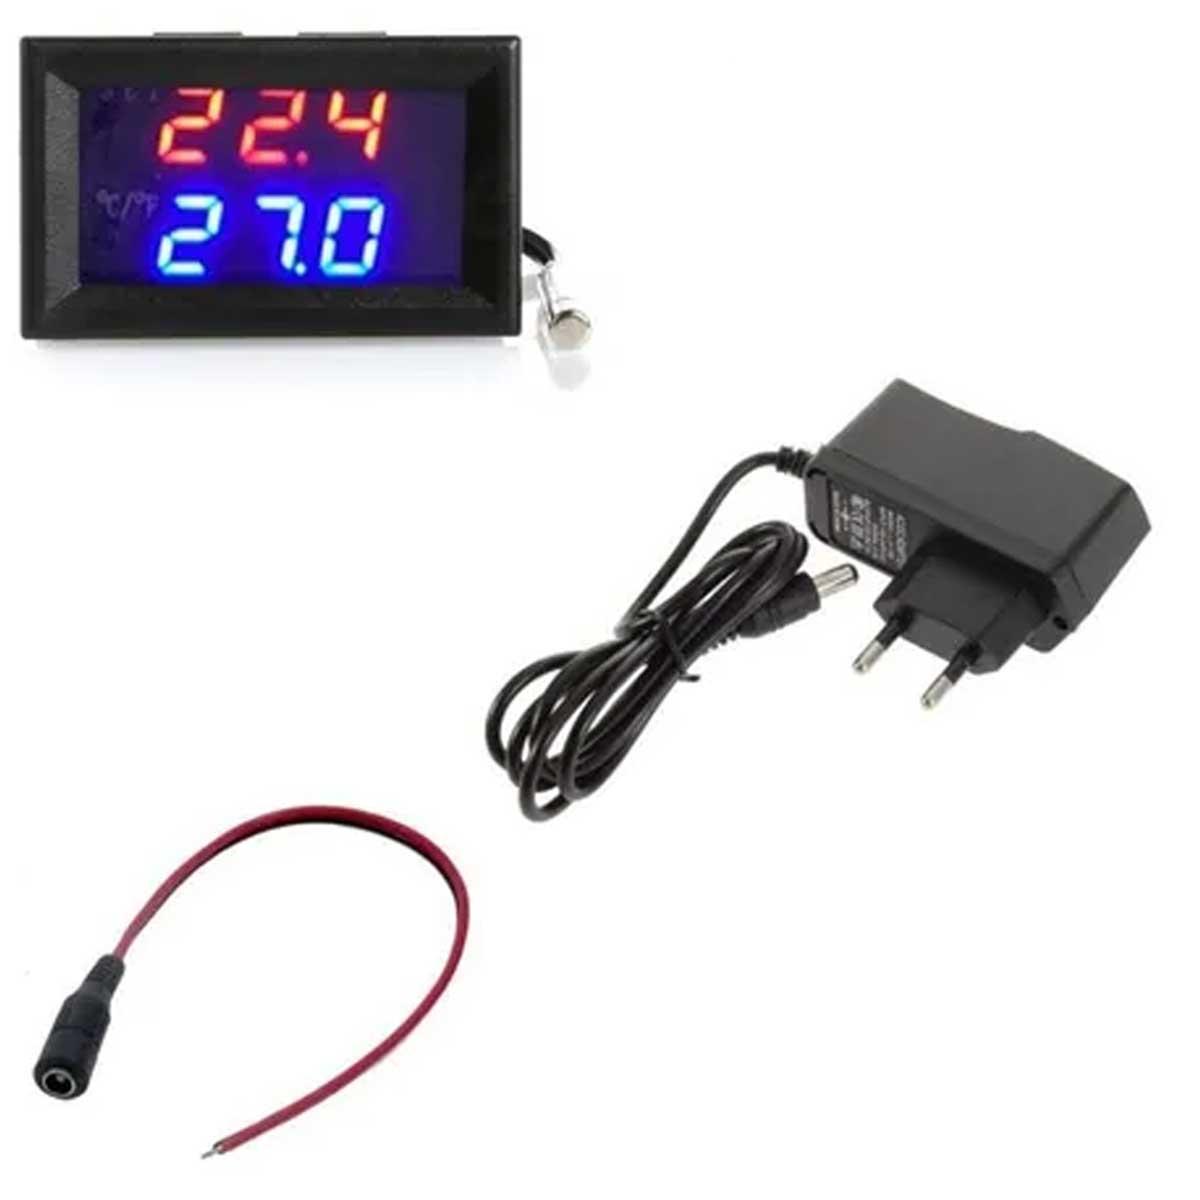 Termostato Display W1209 para Controle de Temperatura + Fonte 12v + Rabicho para Fonte